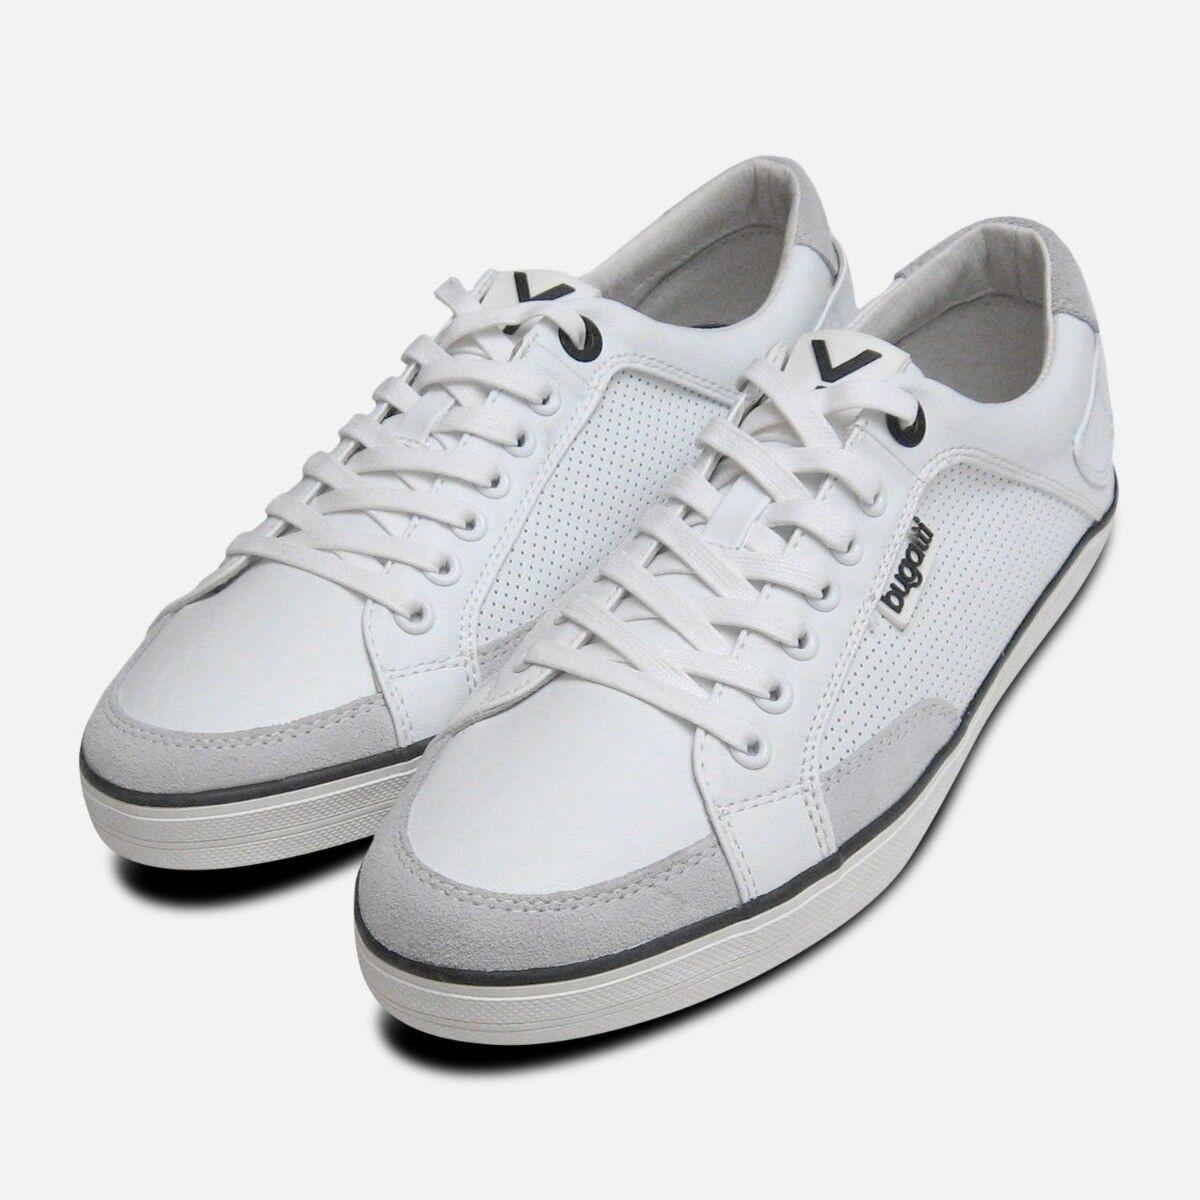 Mens White Leather Designer Trainers by Bugatti Sneakers